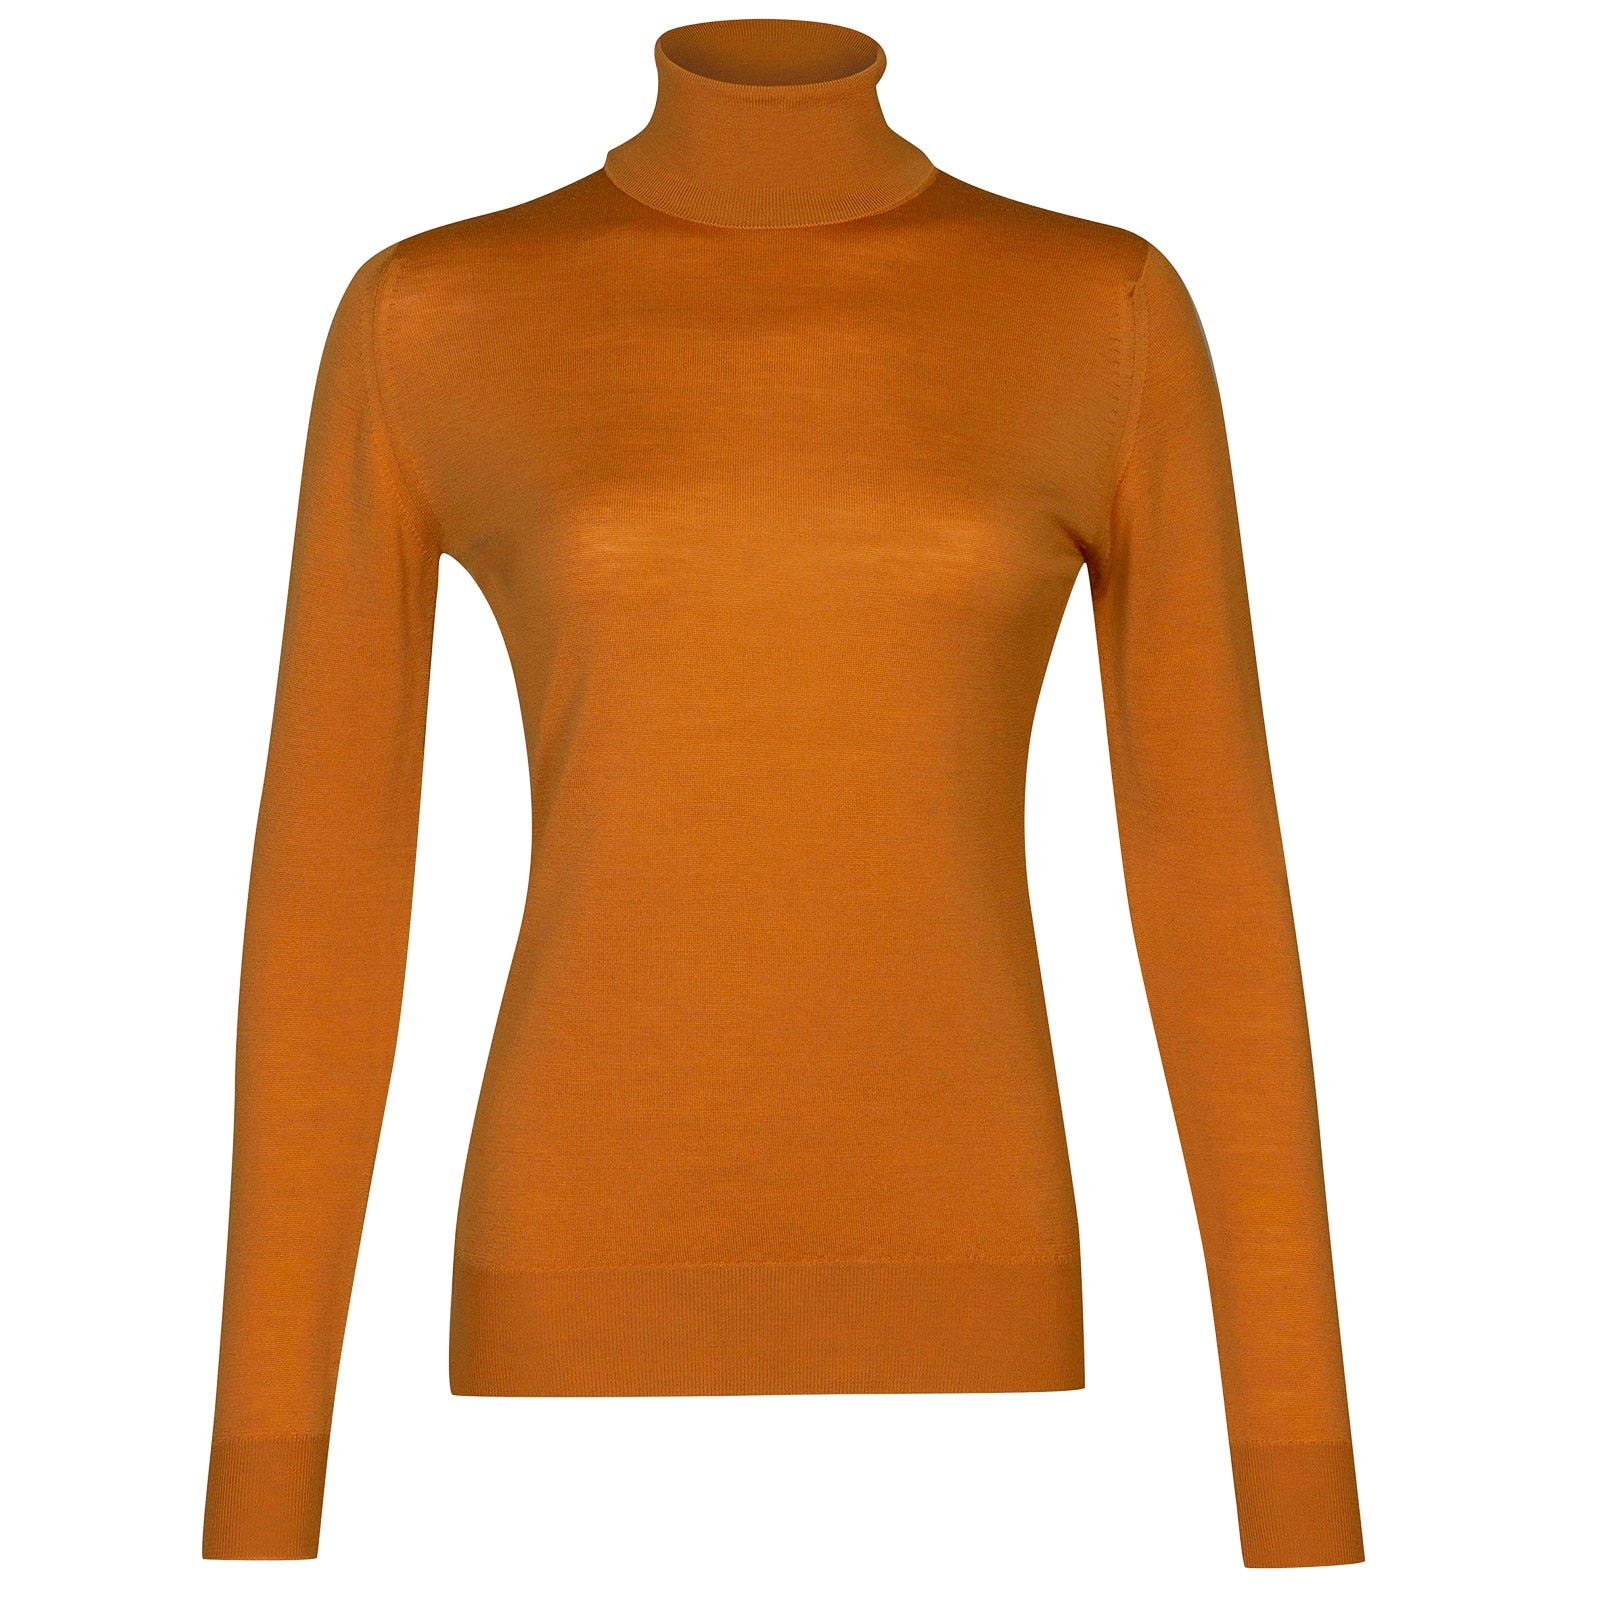 John Smedley Catkin Sweater in Bronze-M